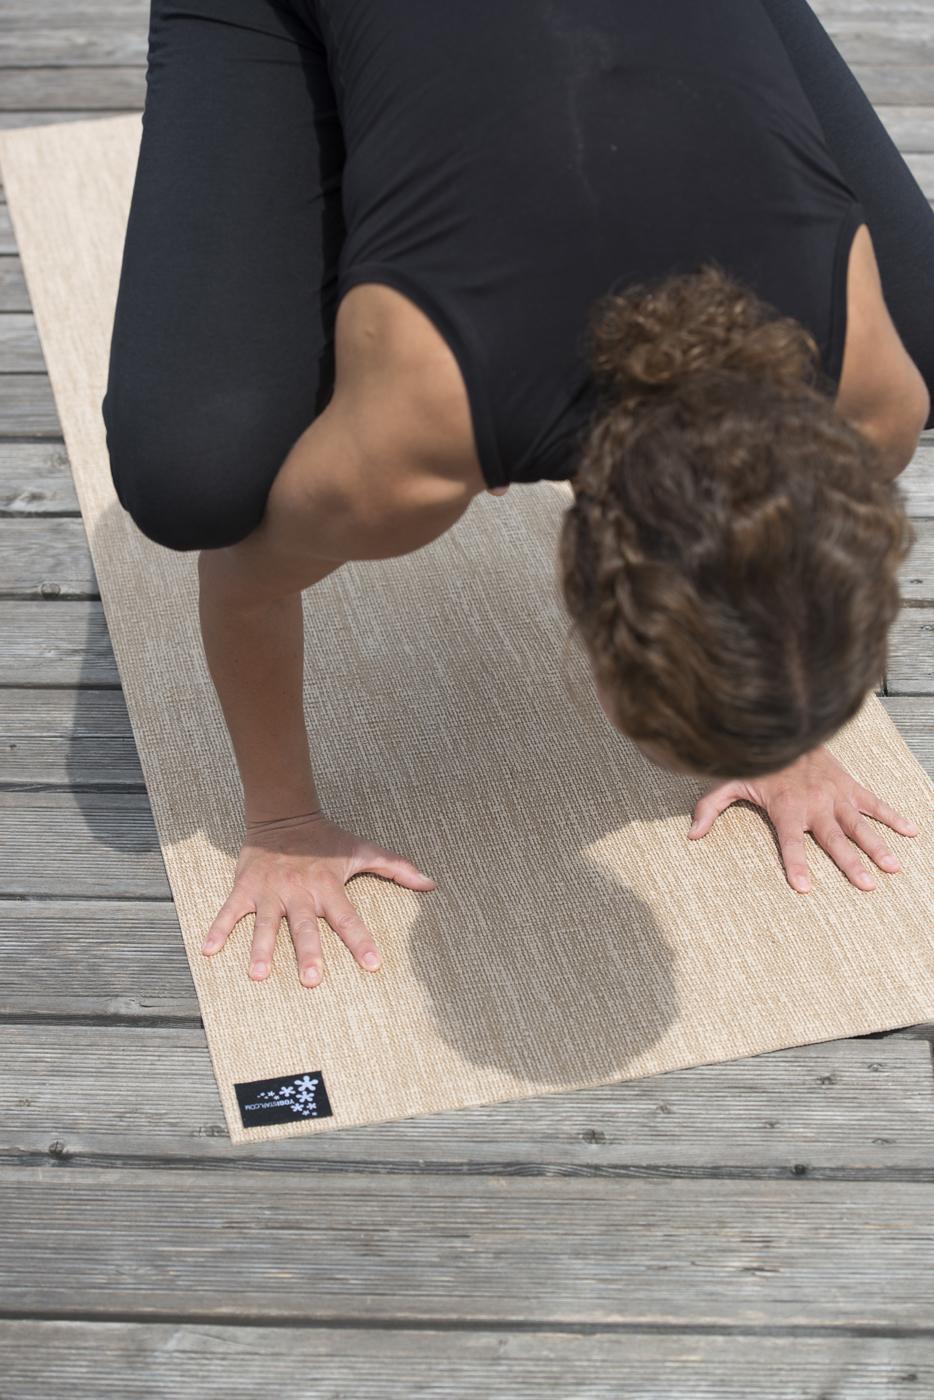 yogamatte yogimat jute im yogistar com kaufen yoga zubeh r yogamatten und yoga. Black Bedroom Furniture Sets. Home Design Ideas